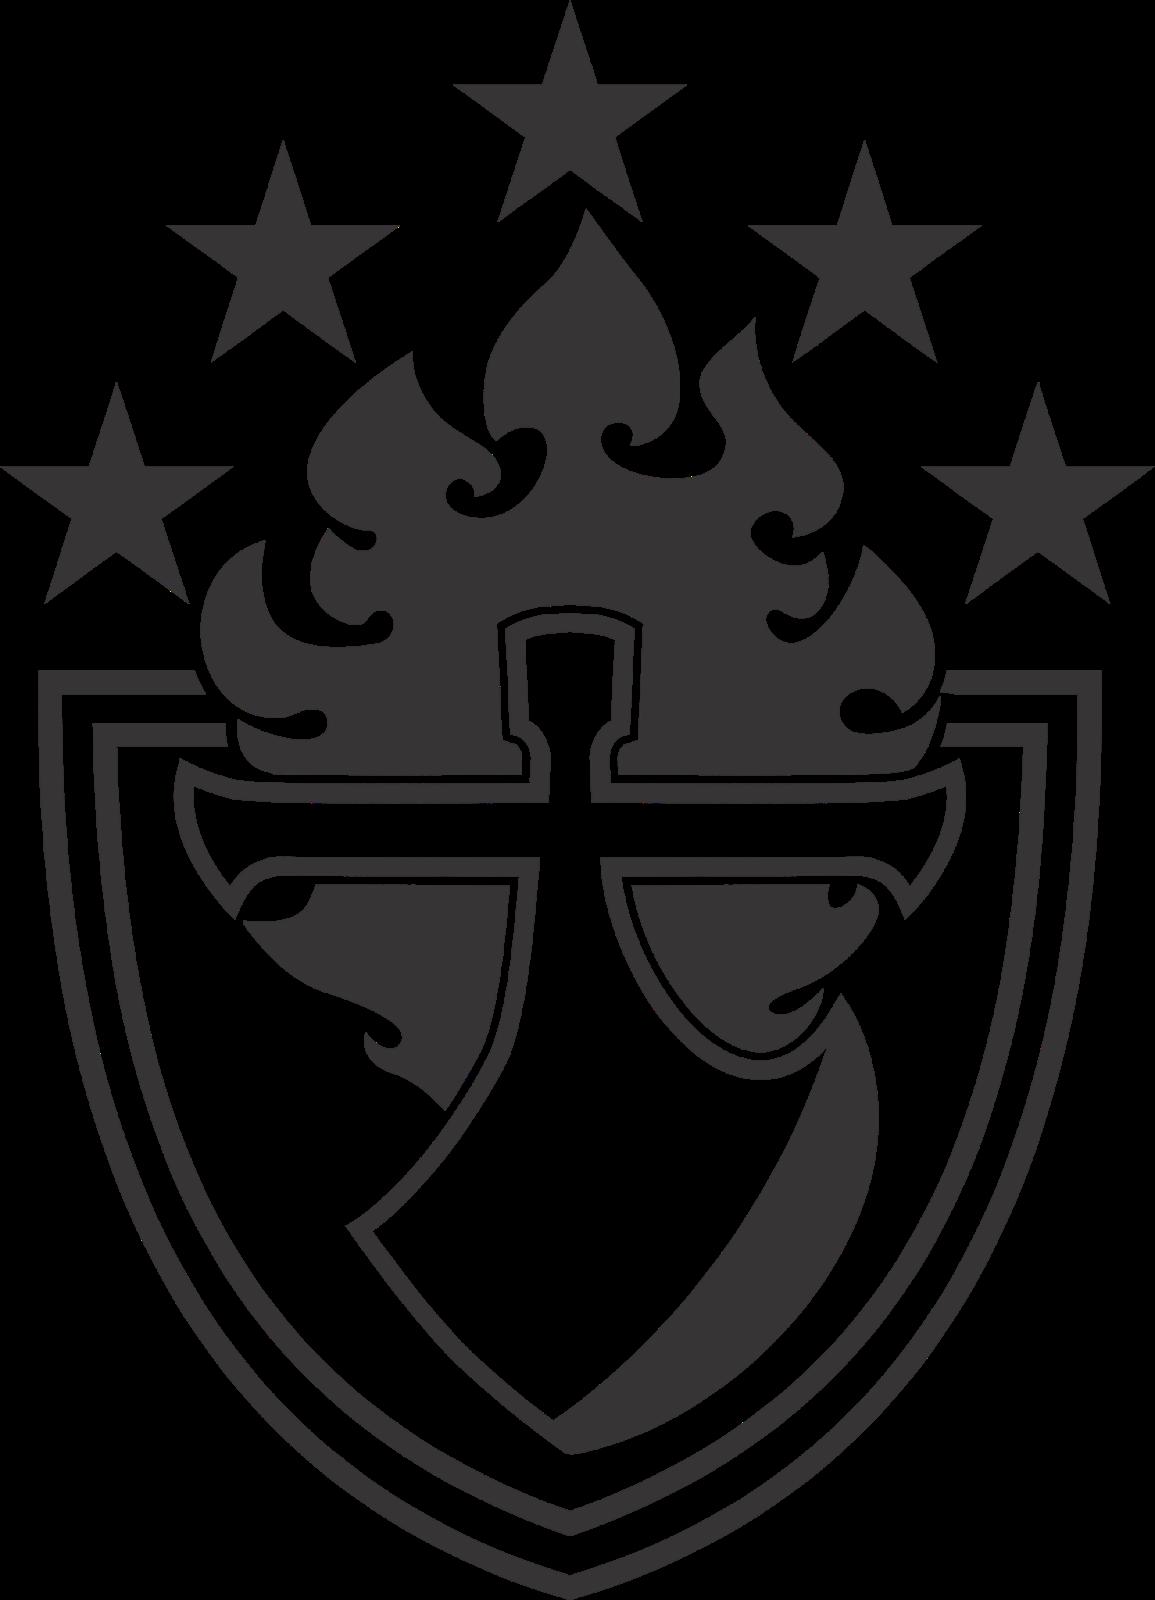 logo fakultas teknik universitas udayana ft unud jhonarendra